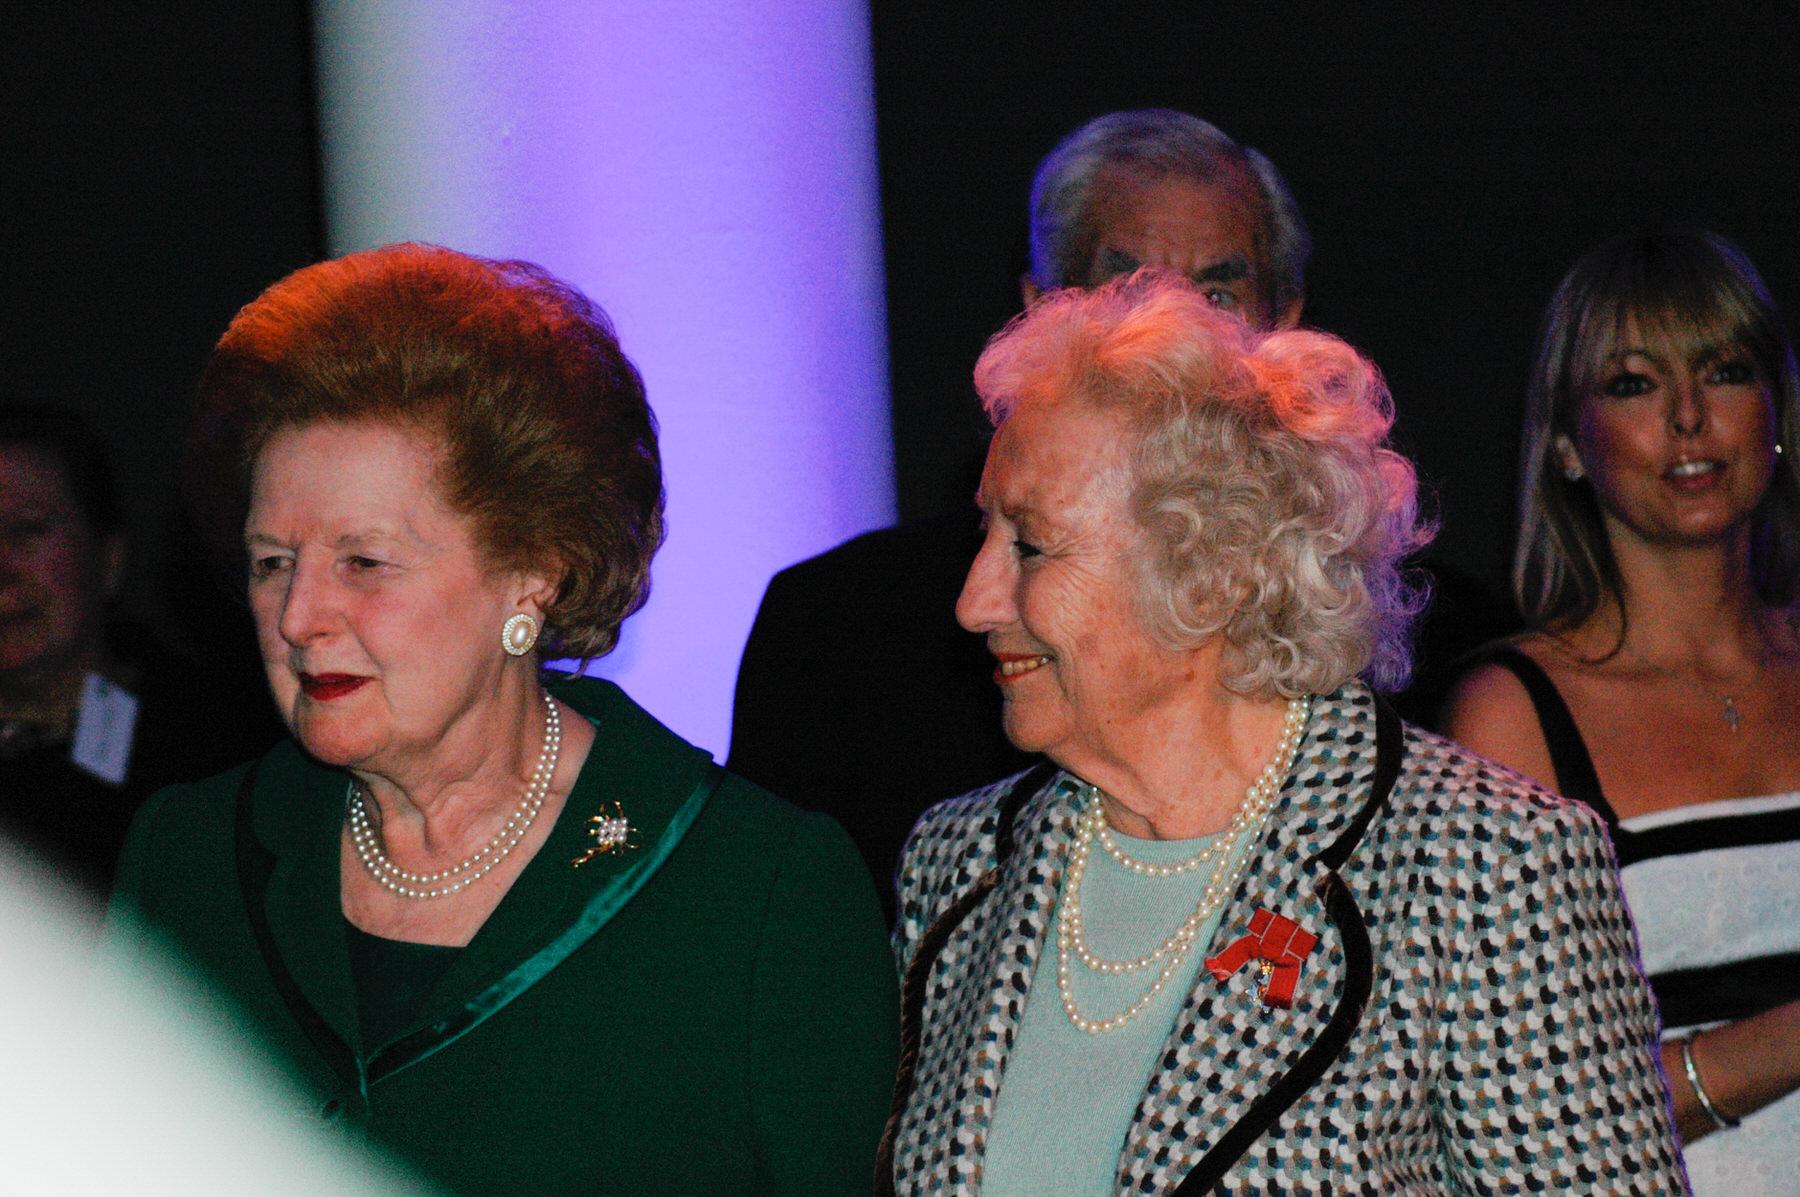 3-Dame Vera Lynn 90th birthday Imperial war Museum Margaret Thatcher.jpg